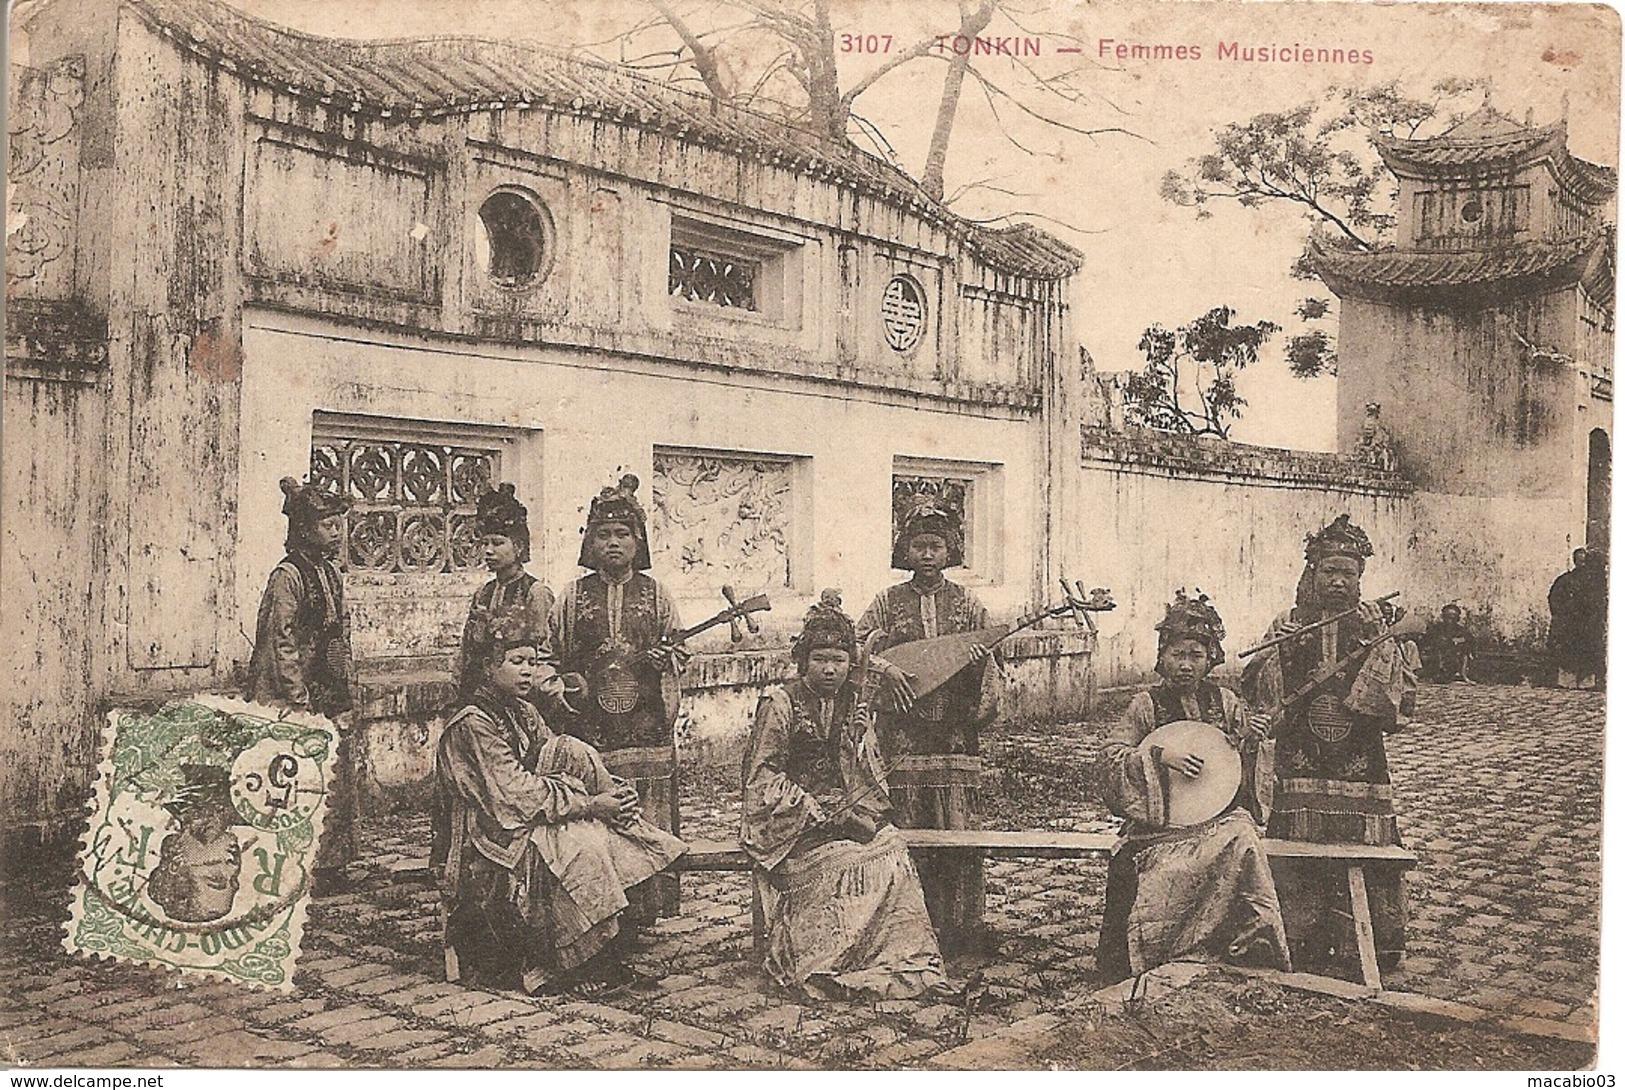 Asie:  Indo-Chine Française  -  Tonkin - Femmes Musiciennes  Réf 3008 - Cartes Postales